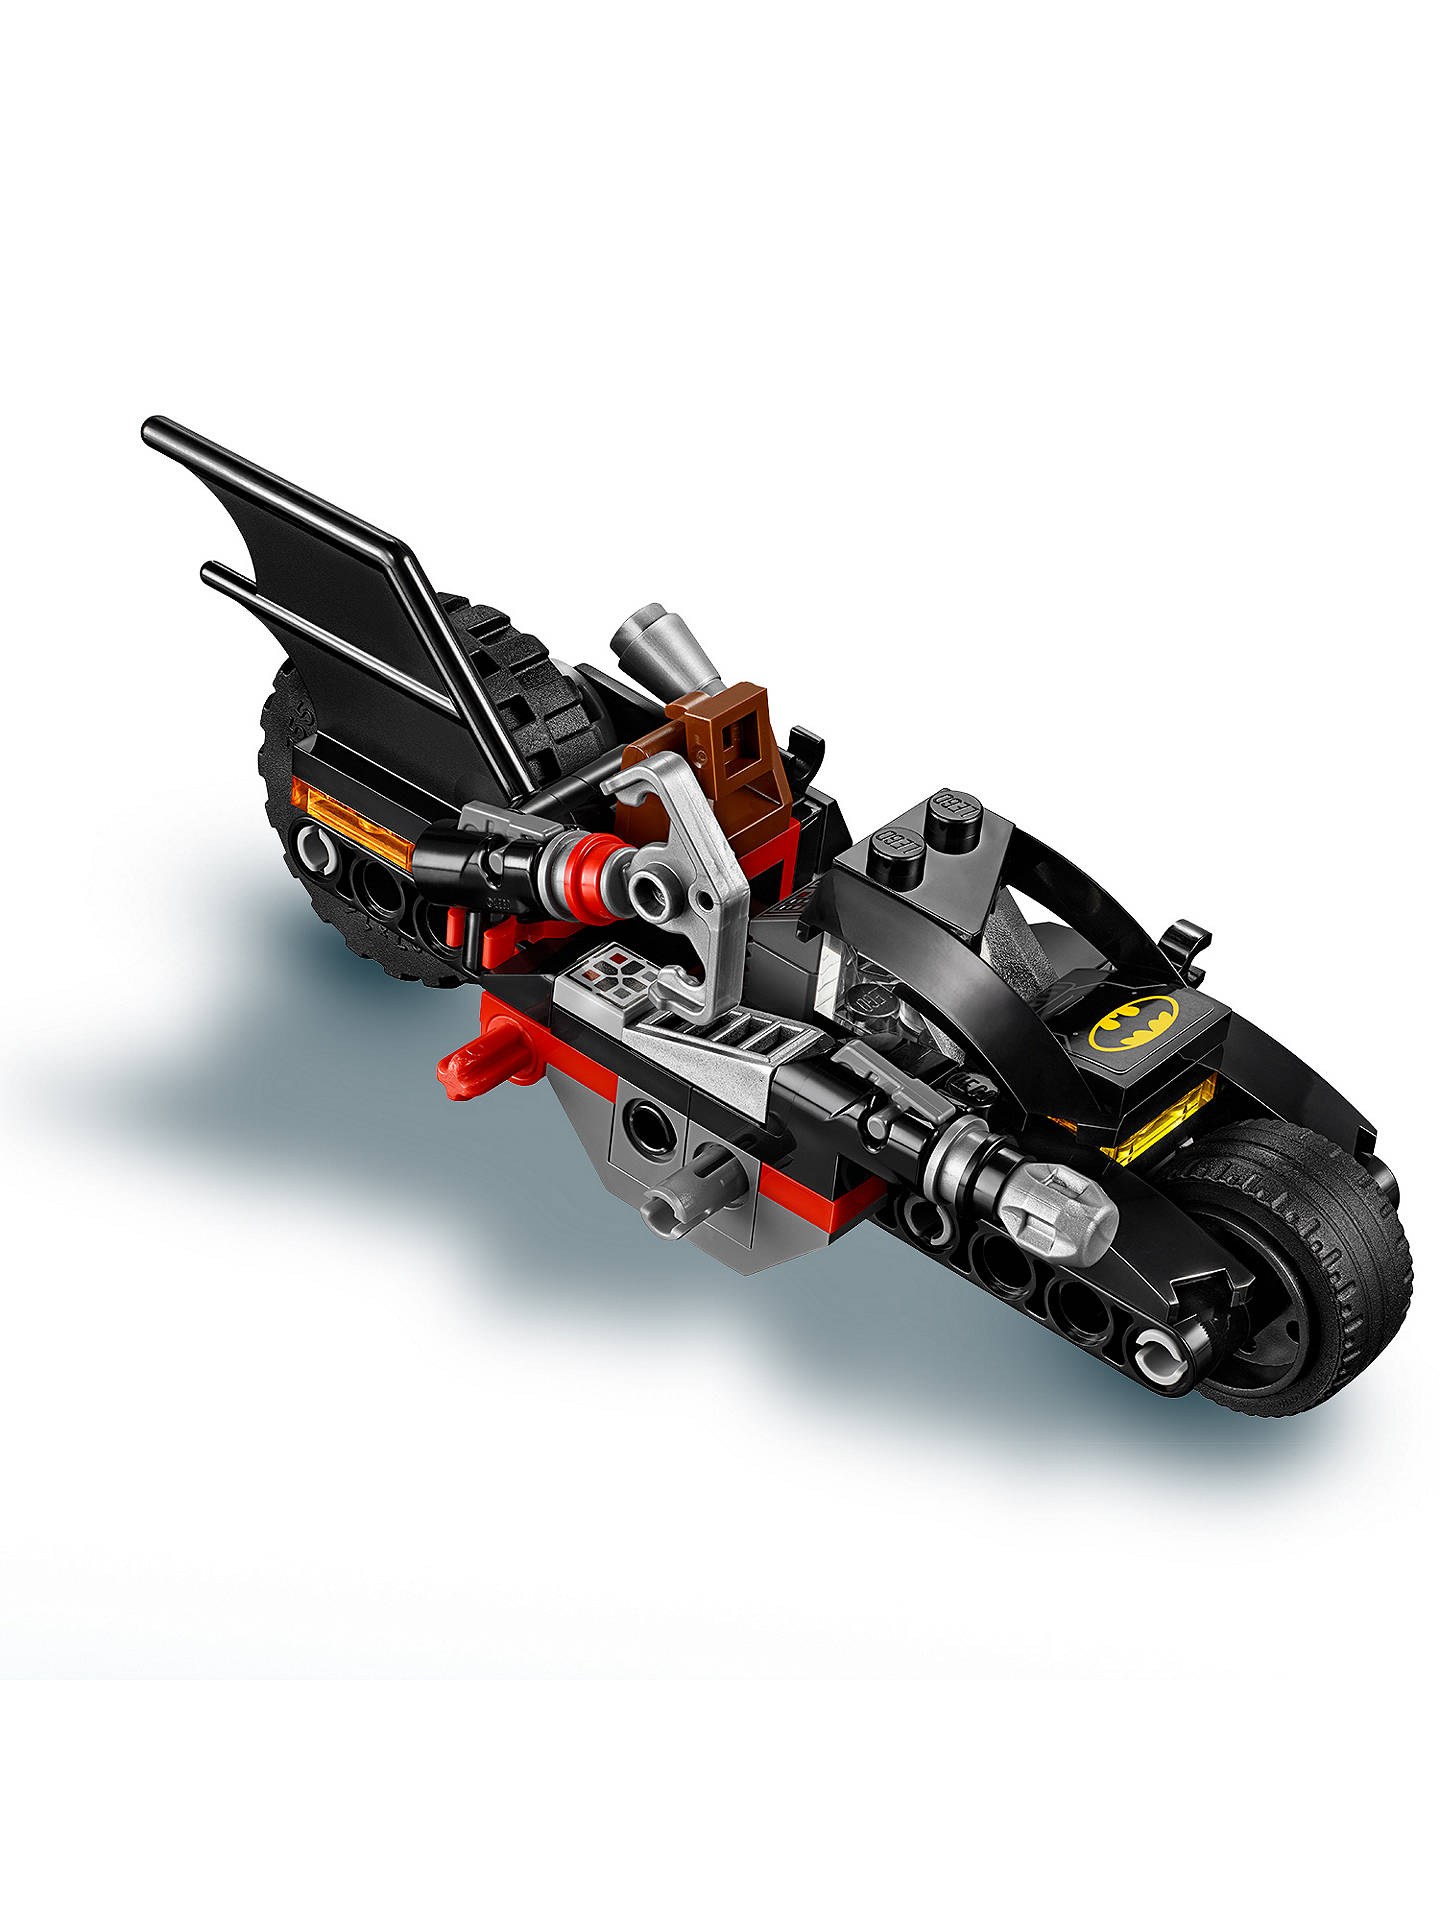 WHITE Motorcycle ~  Lego ~ Bat Man Series ~ MINT~